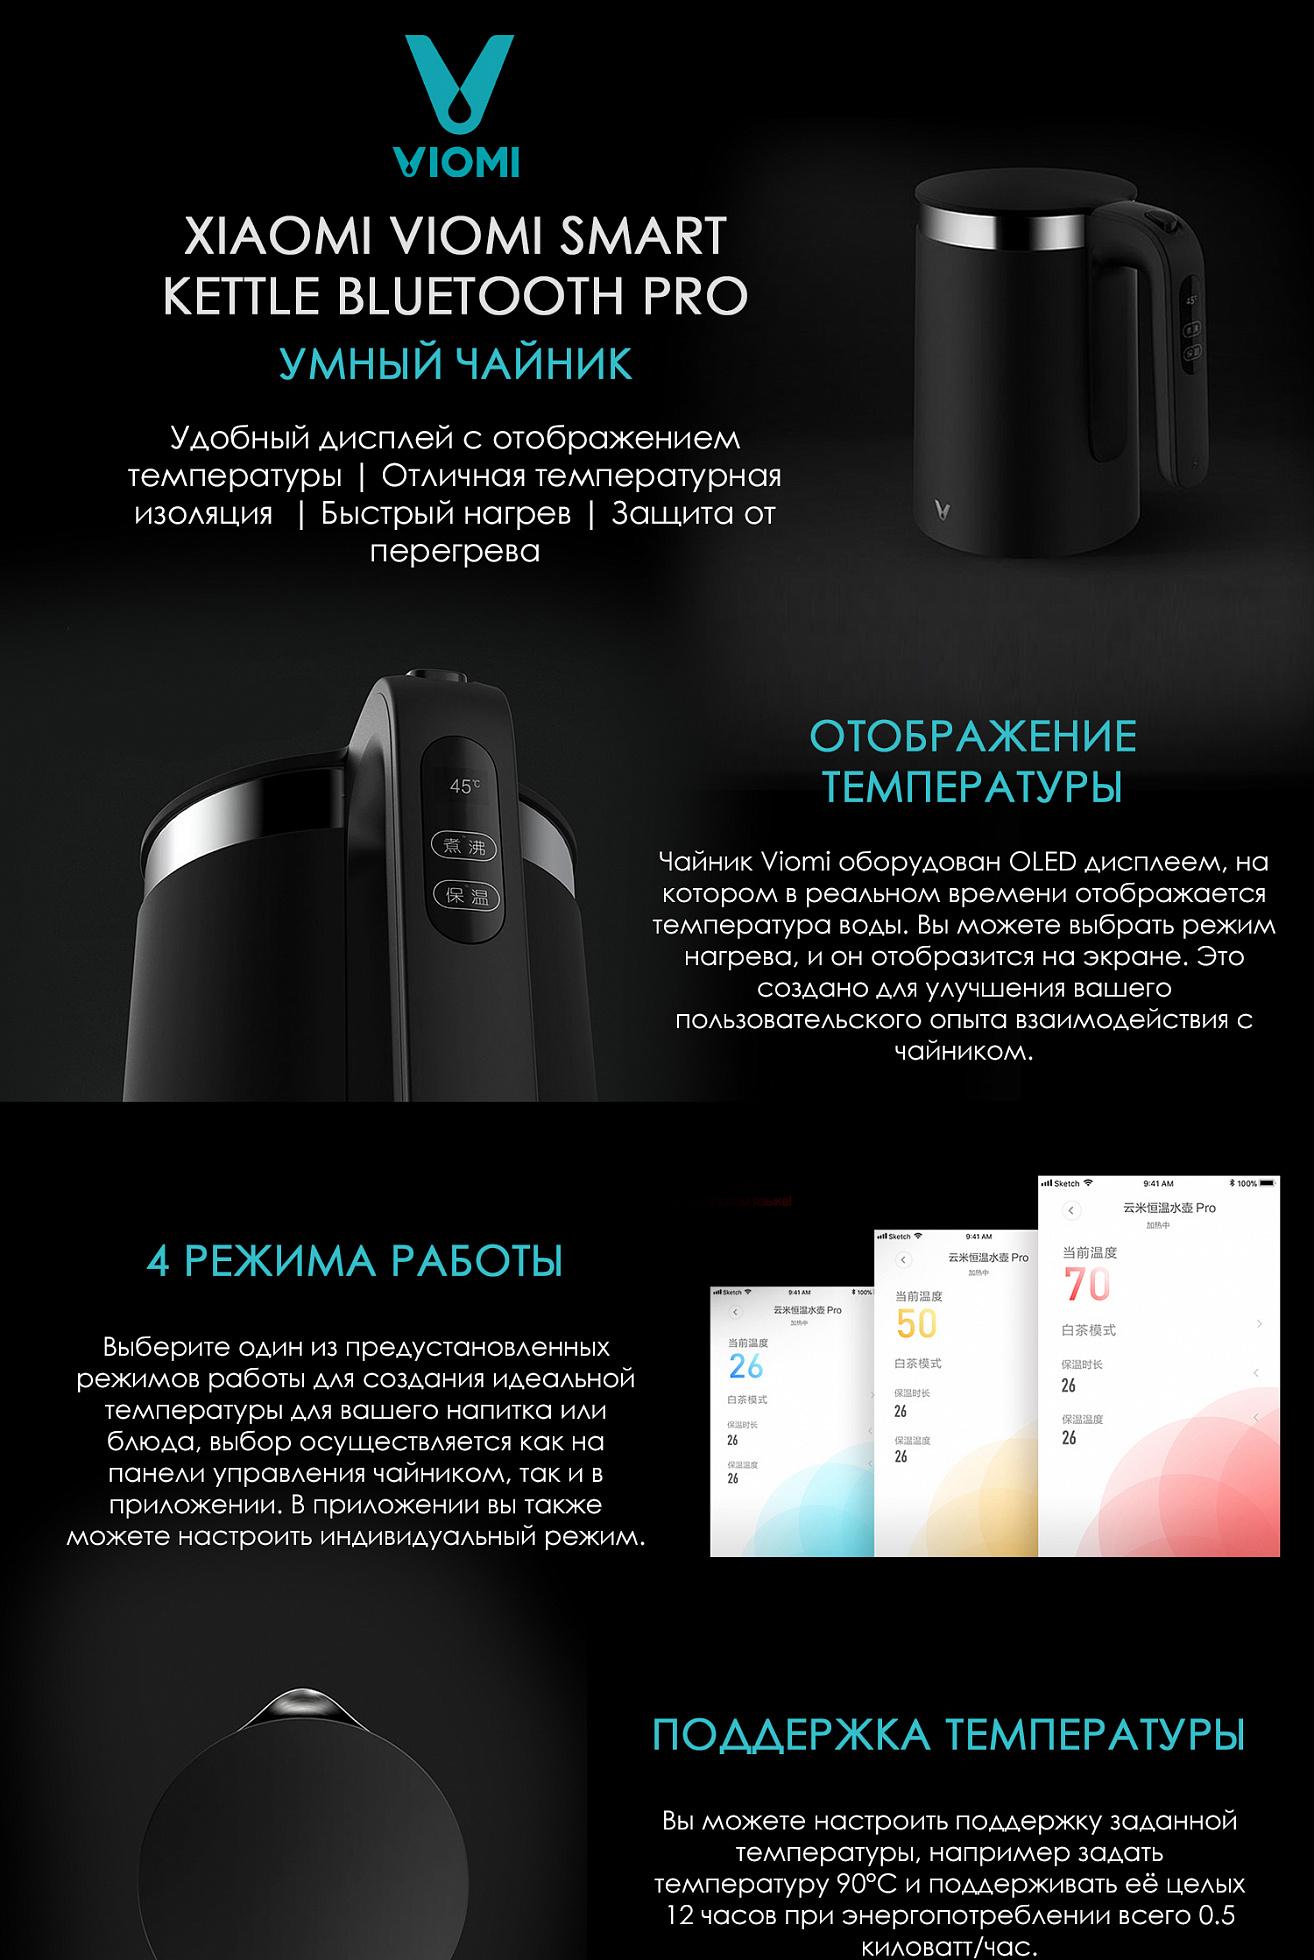 Фото обзора 0 Чайник Xiaomi Viomi Smart Kettle Bluetooth Pro YM-K1503 Black